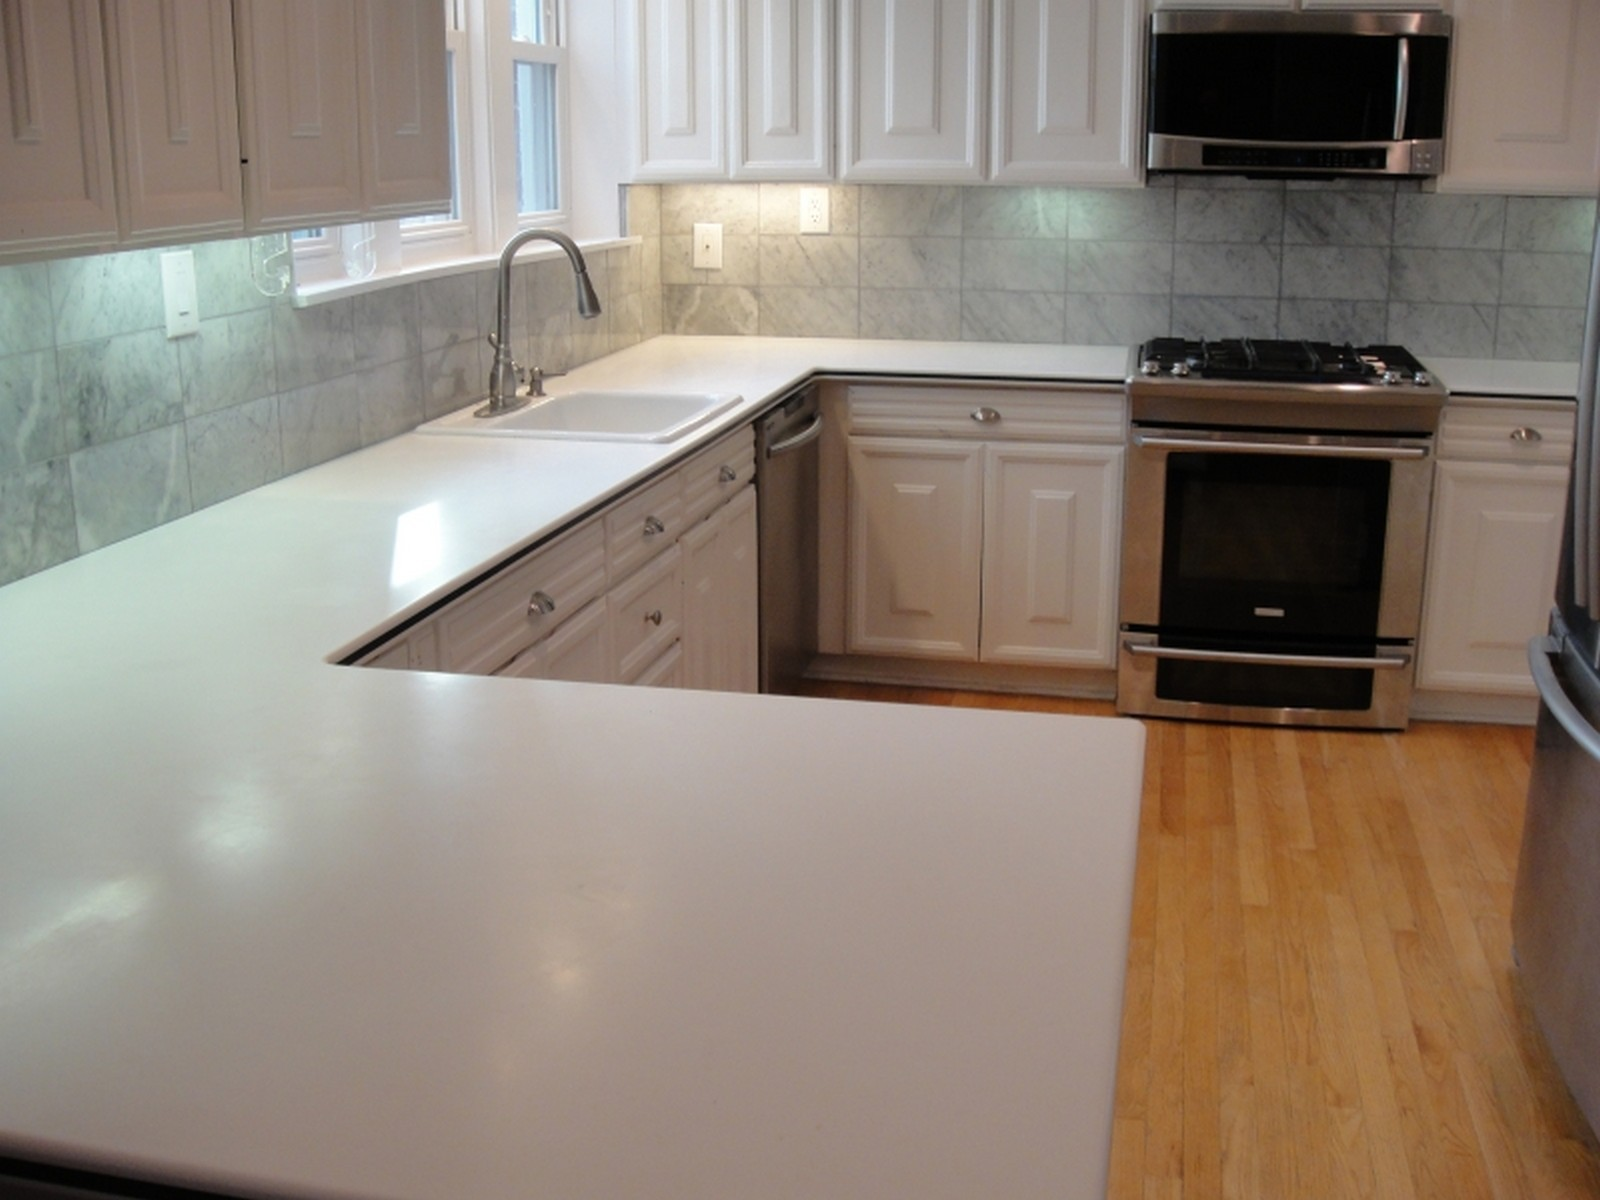 Real Estate Photography - 556 Winnetka Ave, Winnetka, IL, 60093 - Kitchen